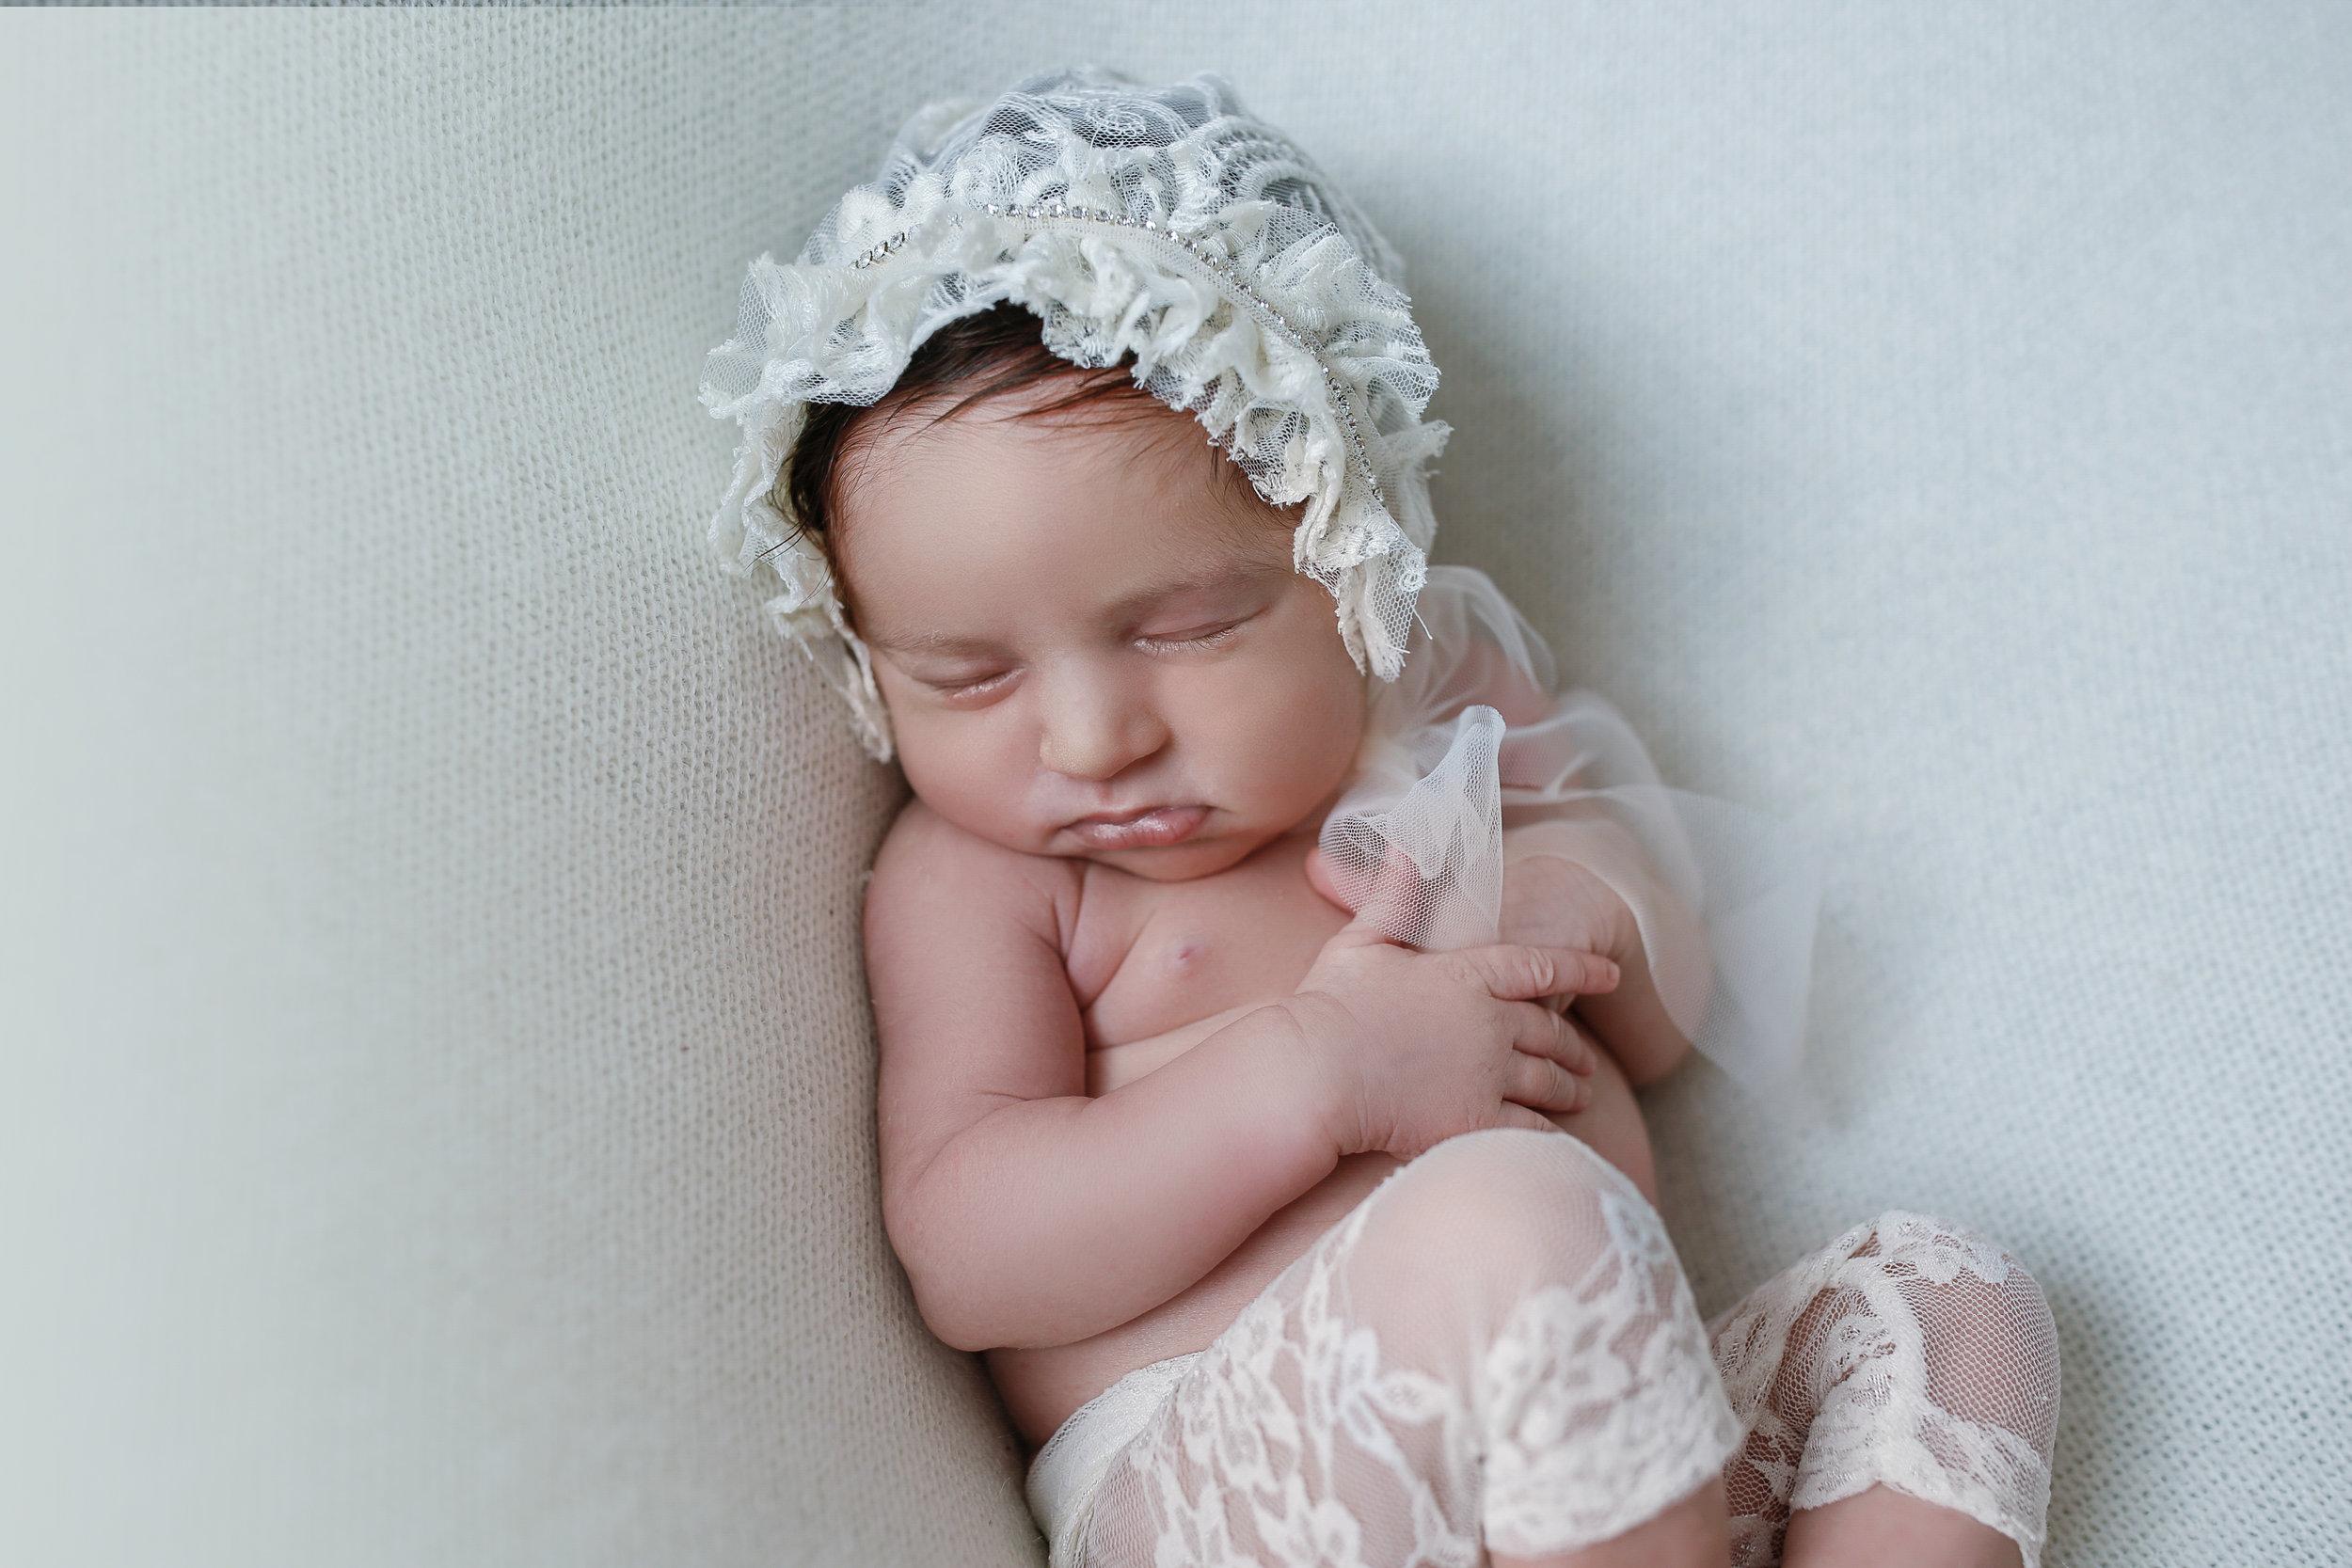 299b83a6e98a6 San Francisco Newborn Photographer   Baby Rose   Campbell Kamine Photography  -23.jpg